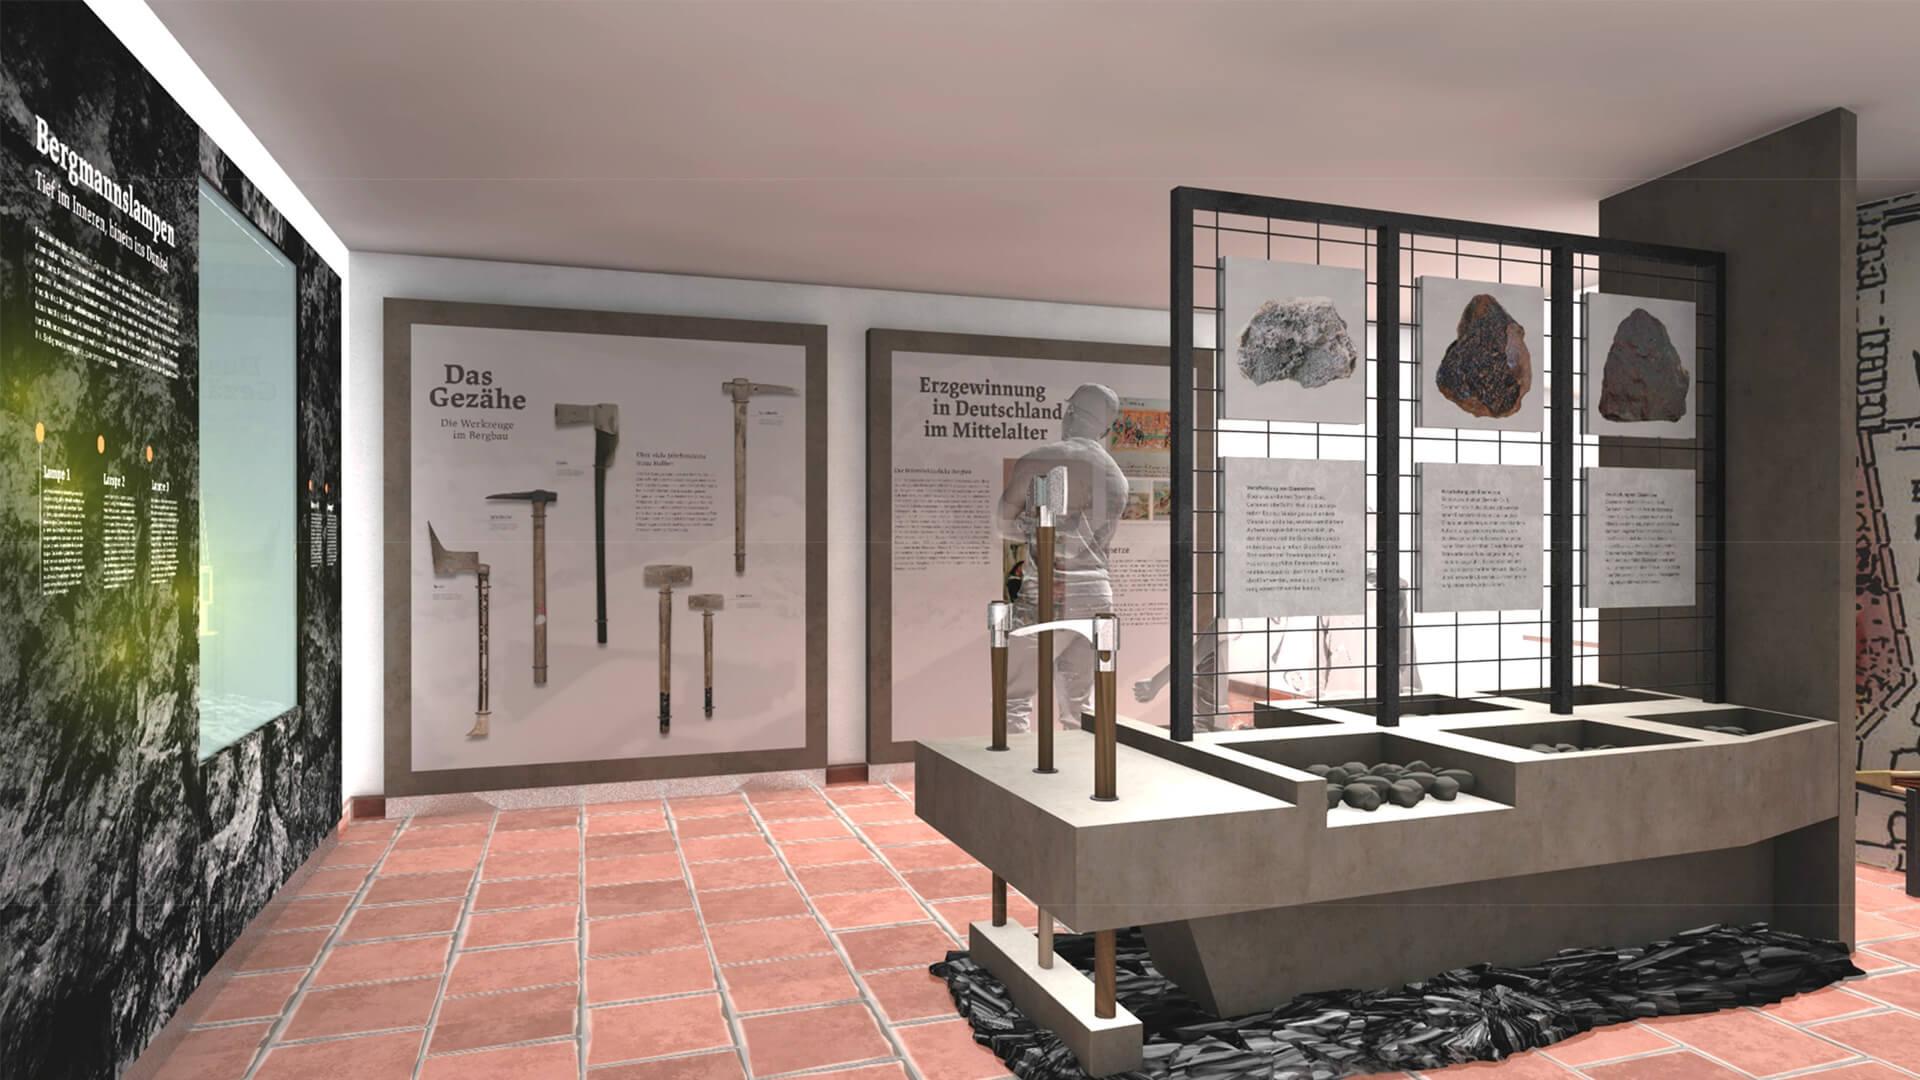 Ausstellung-Bergbaumuseum-Achthal_Teisendorf_04